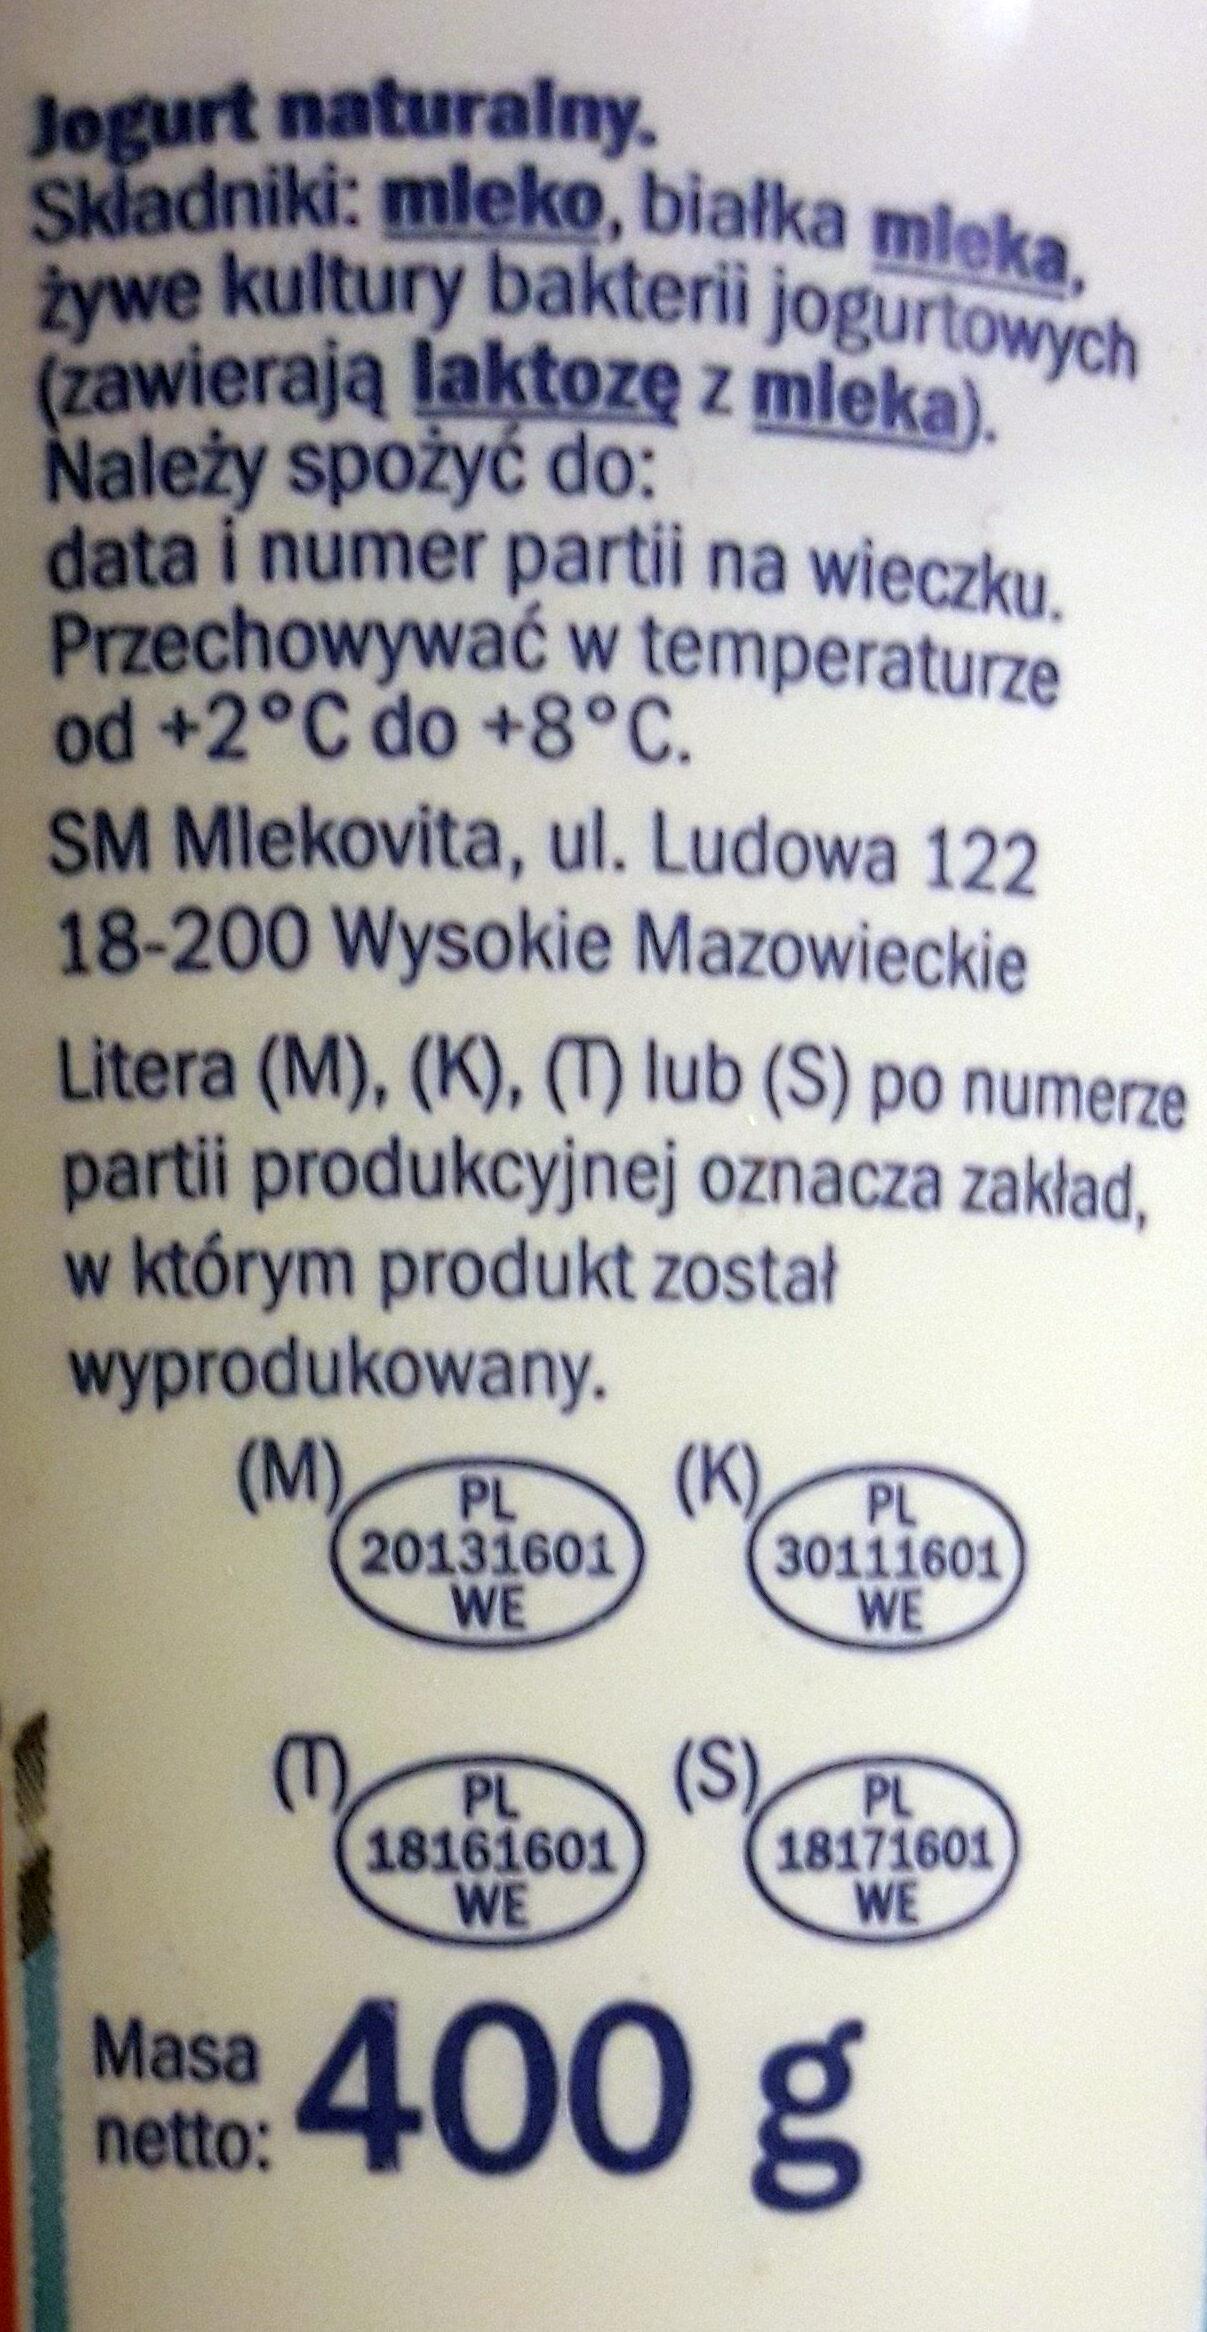 Jogurt naturalny kremowy - Składniki